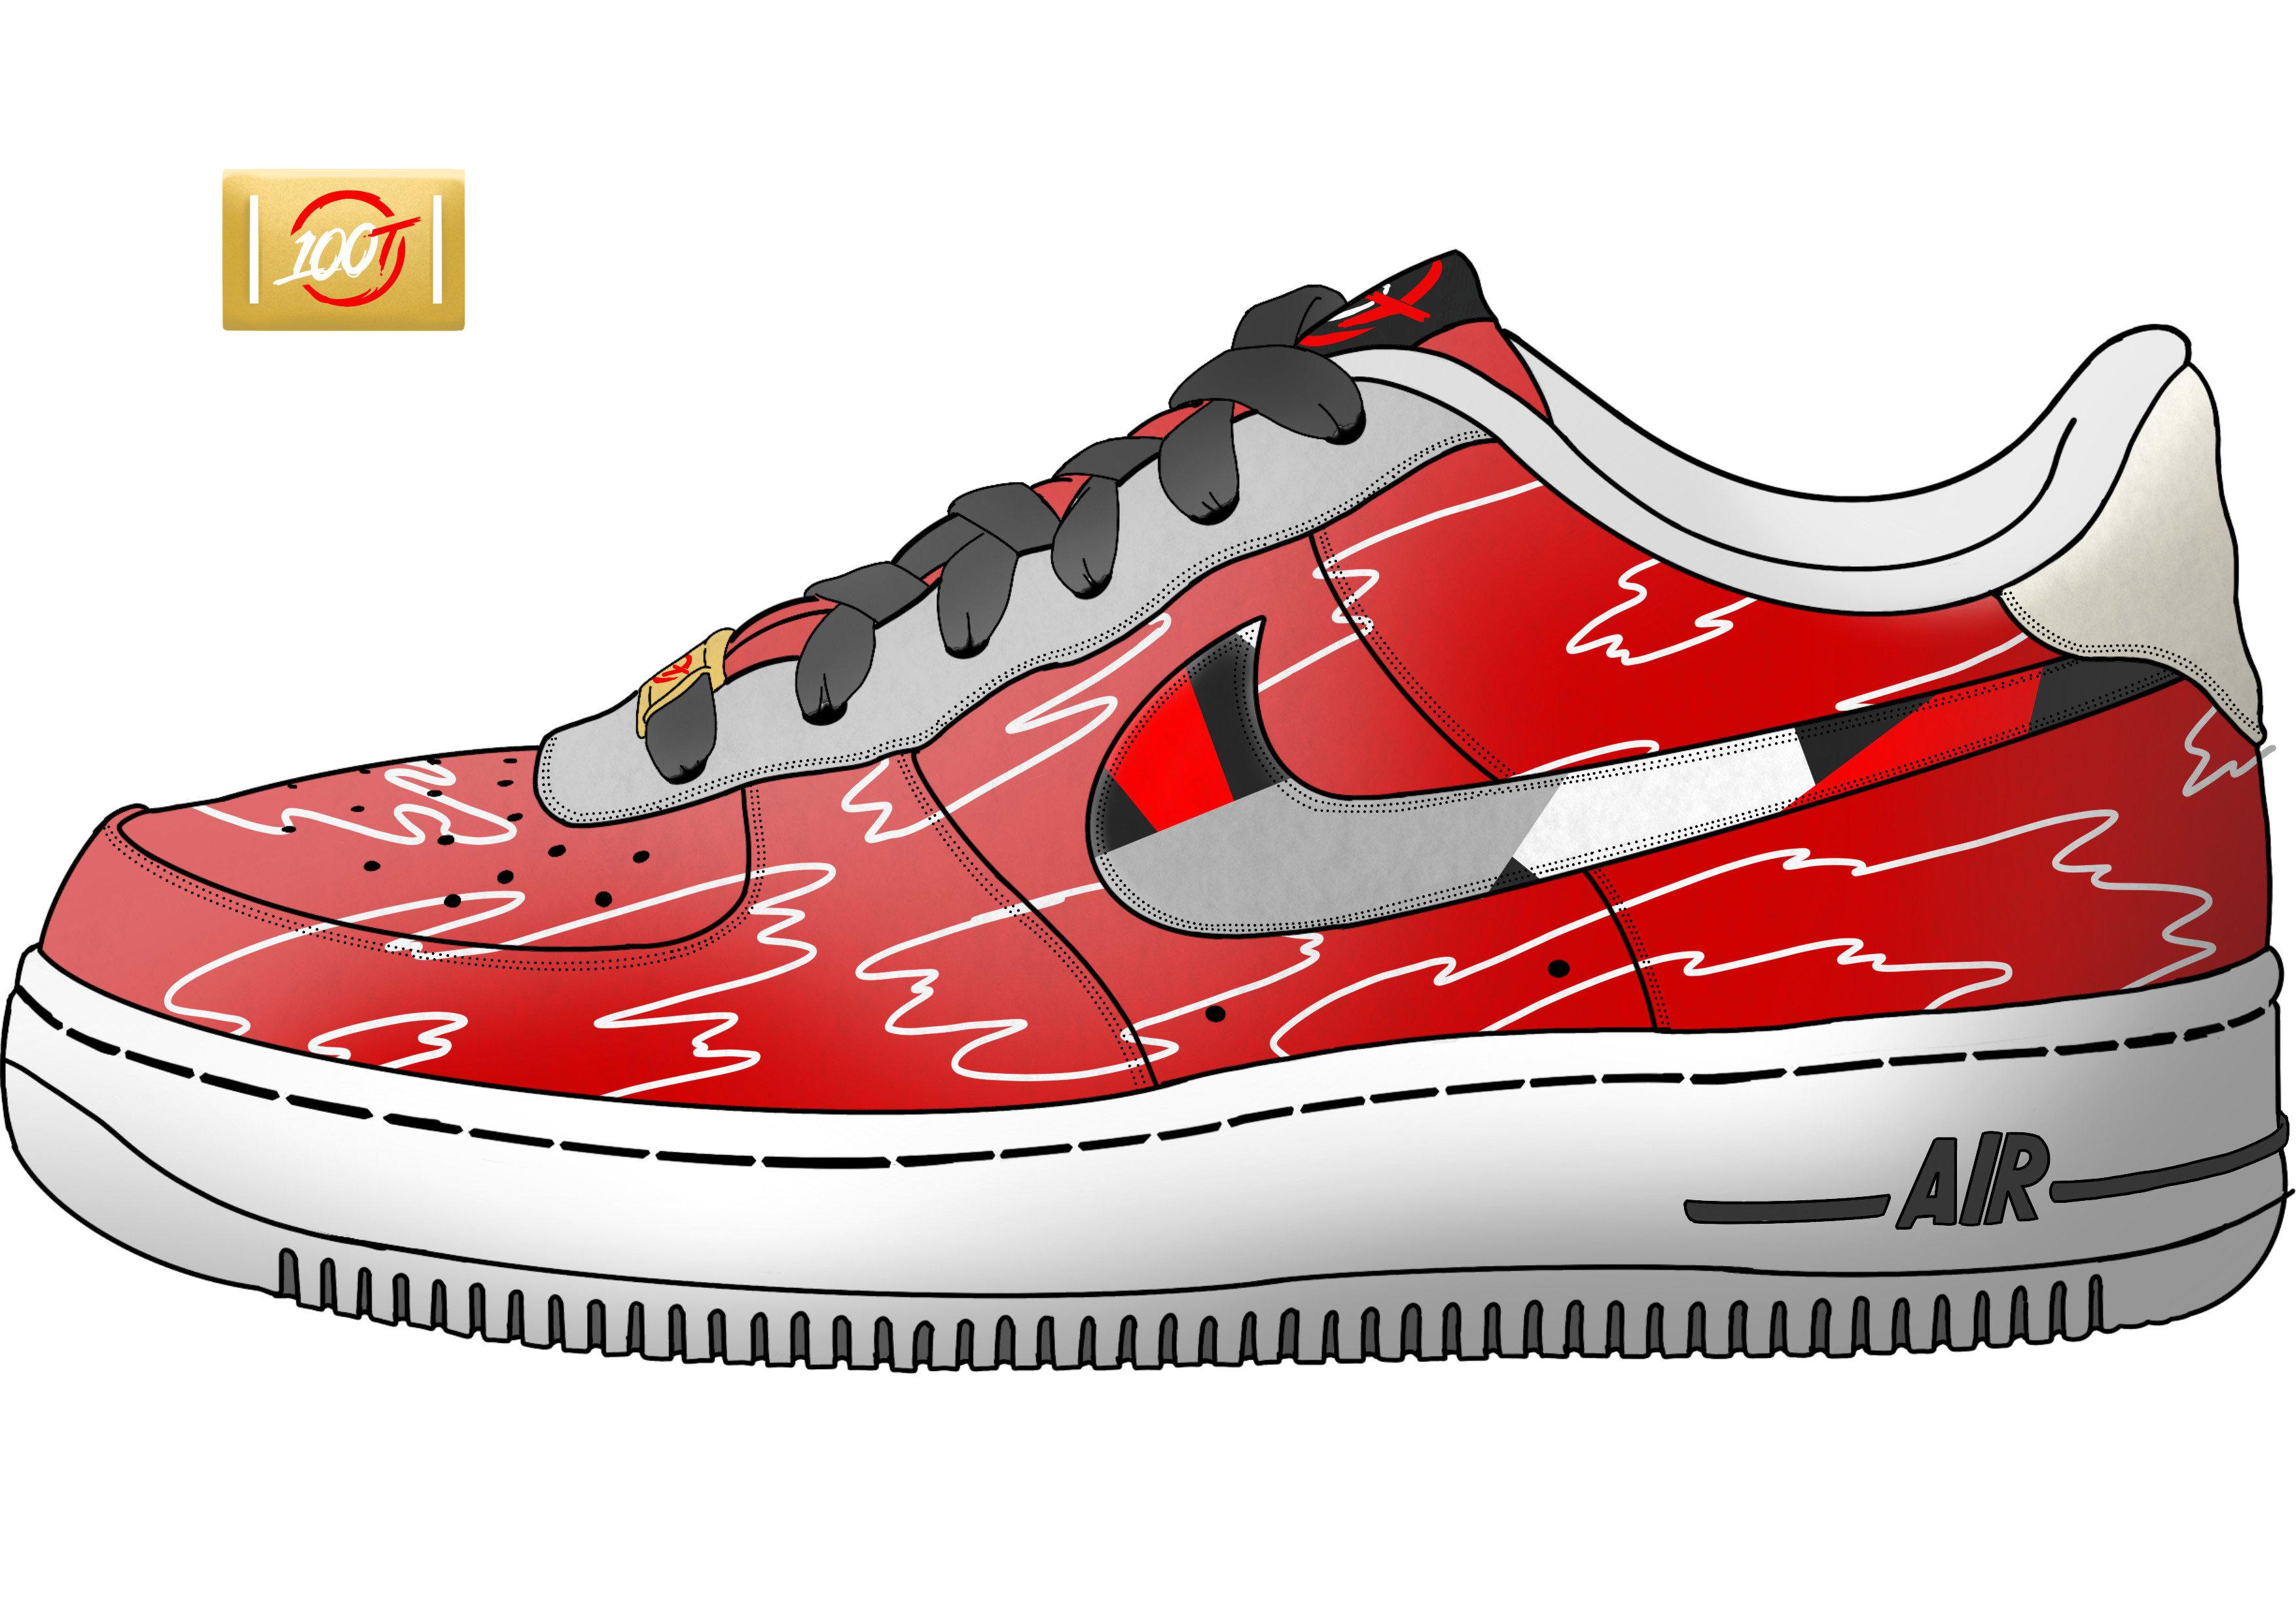 Create custom shoe designs by Pewburt